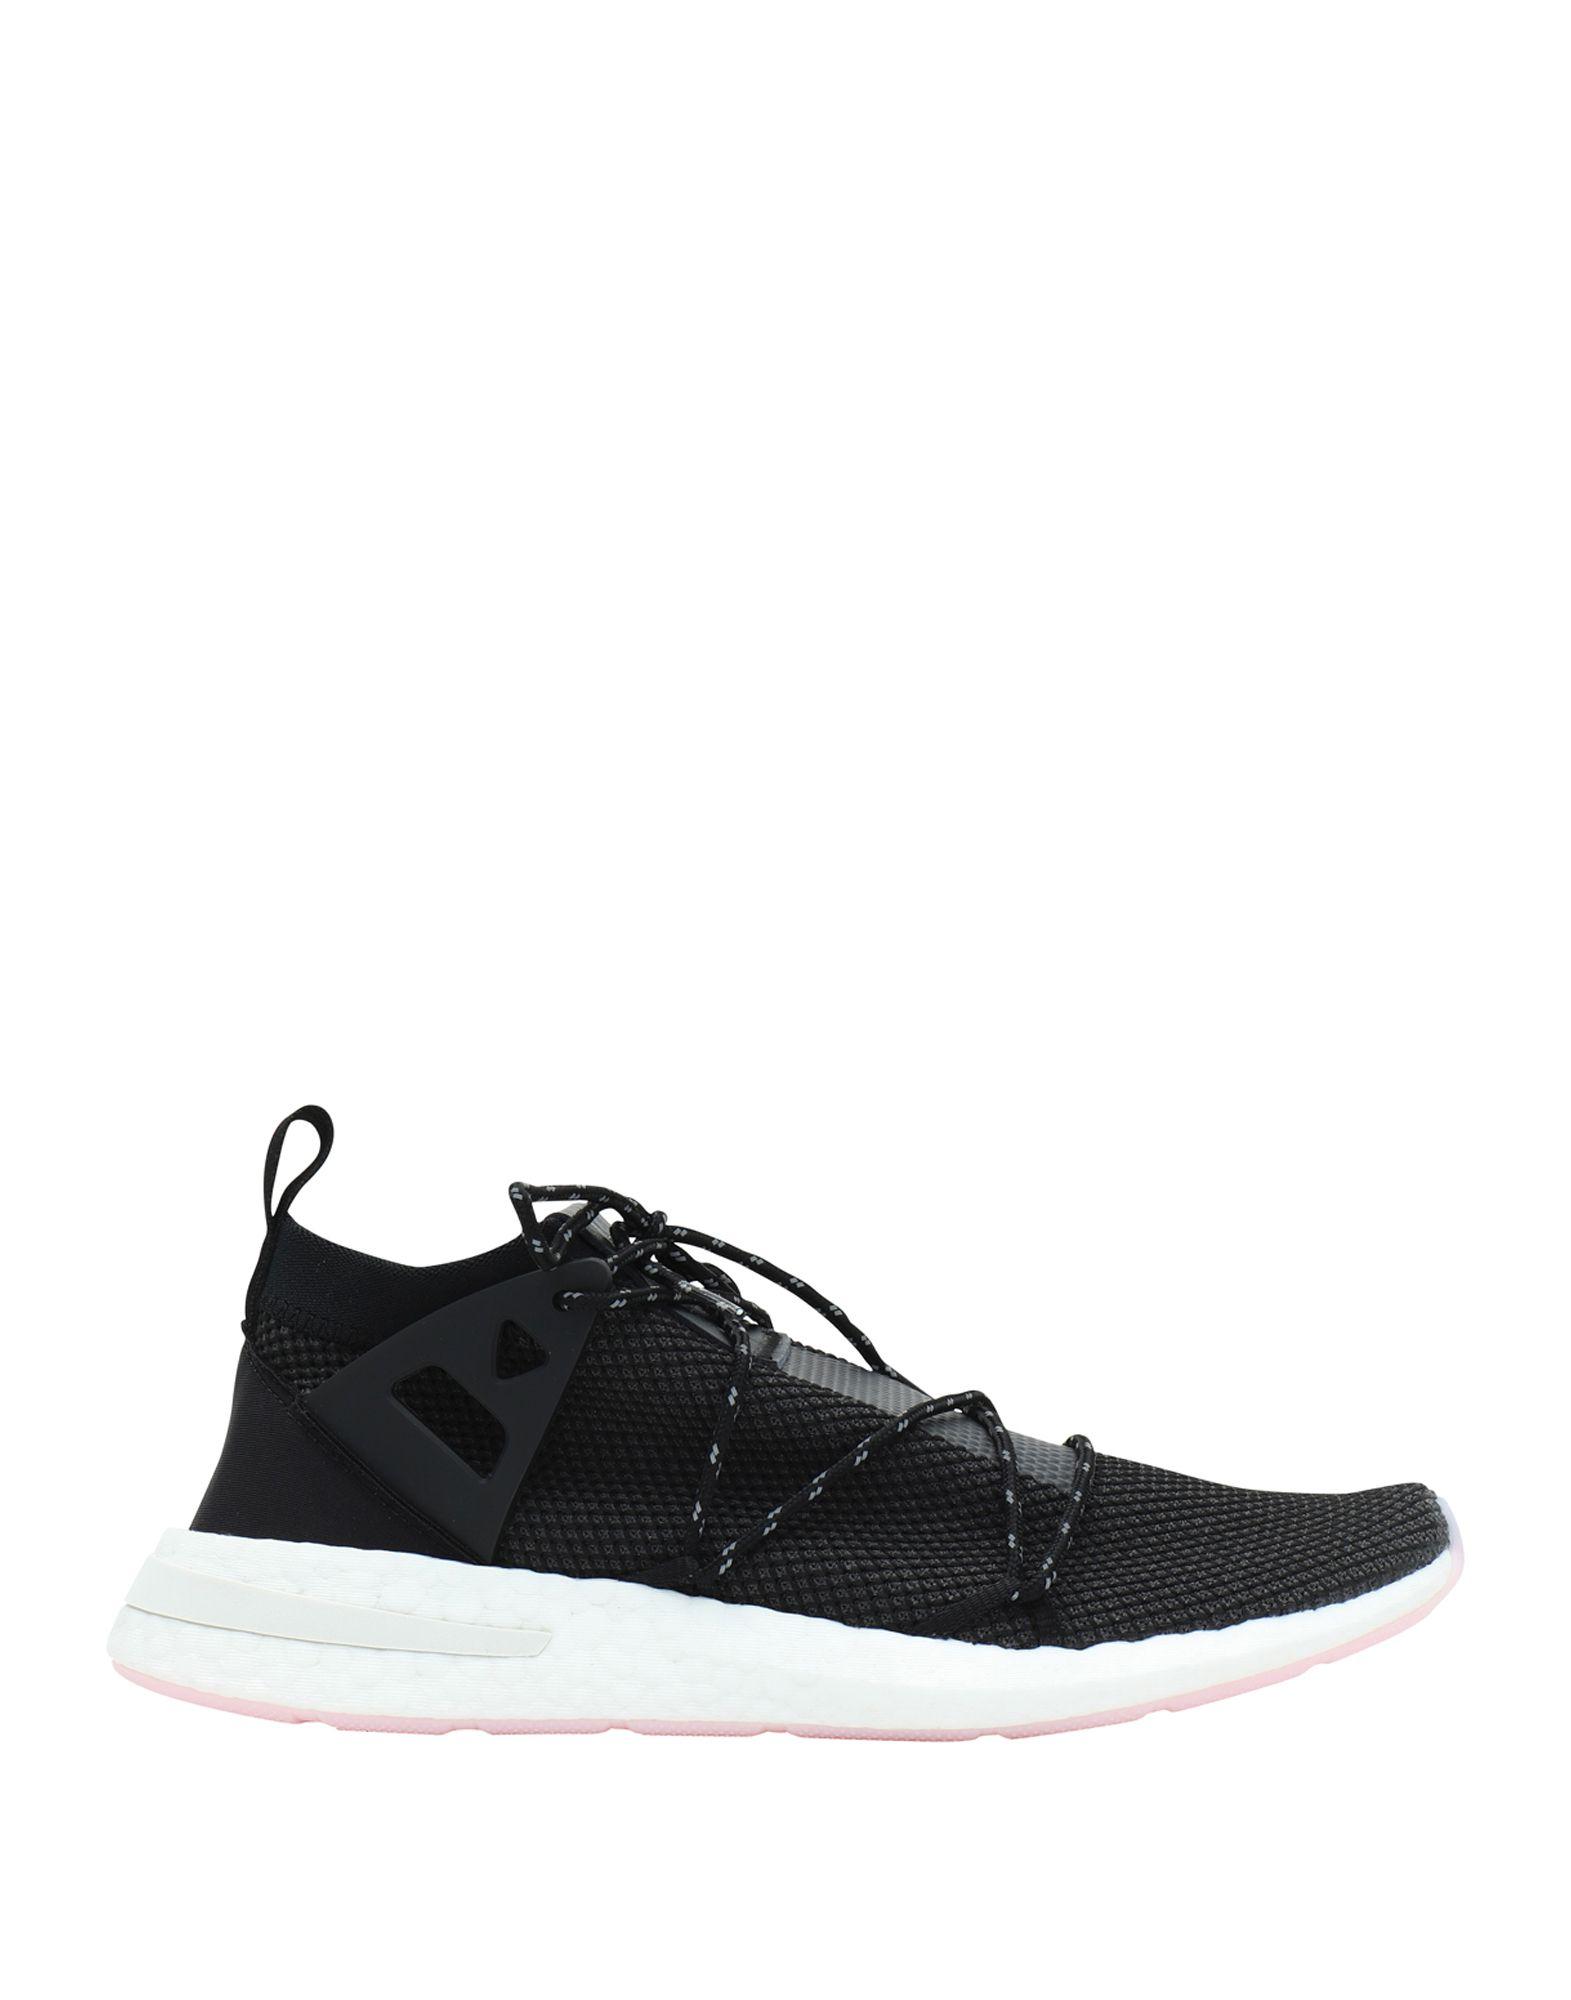 Turnschuhe Adidas Originals Arkyn Knit - damen - 11664642RF